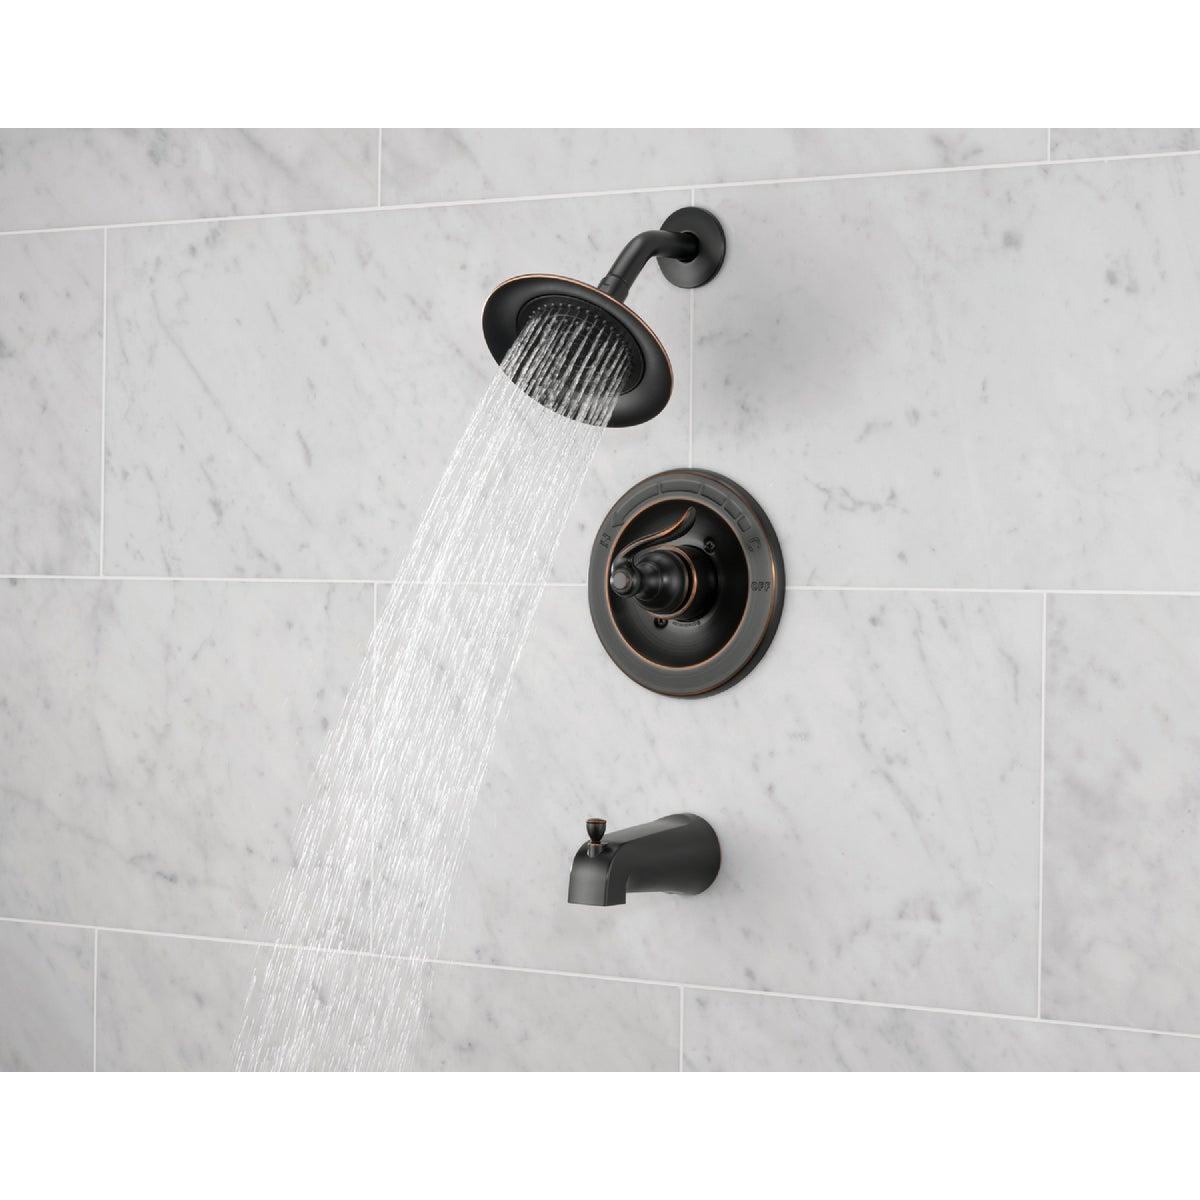 ORB TUB & SHOWER FAUCET - 144996-OB by Delta Faucet Co